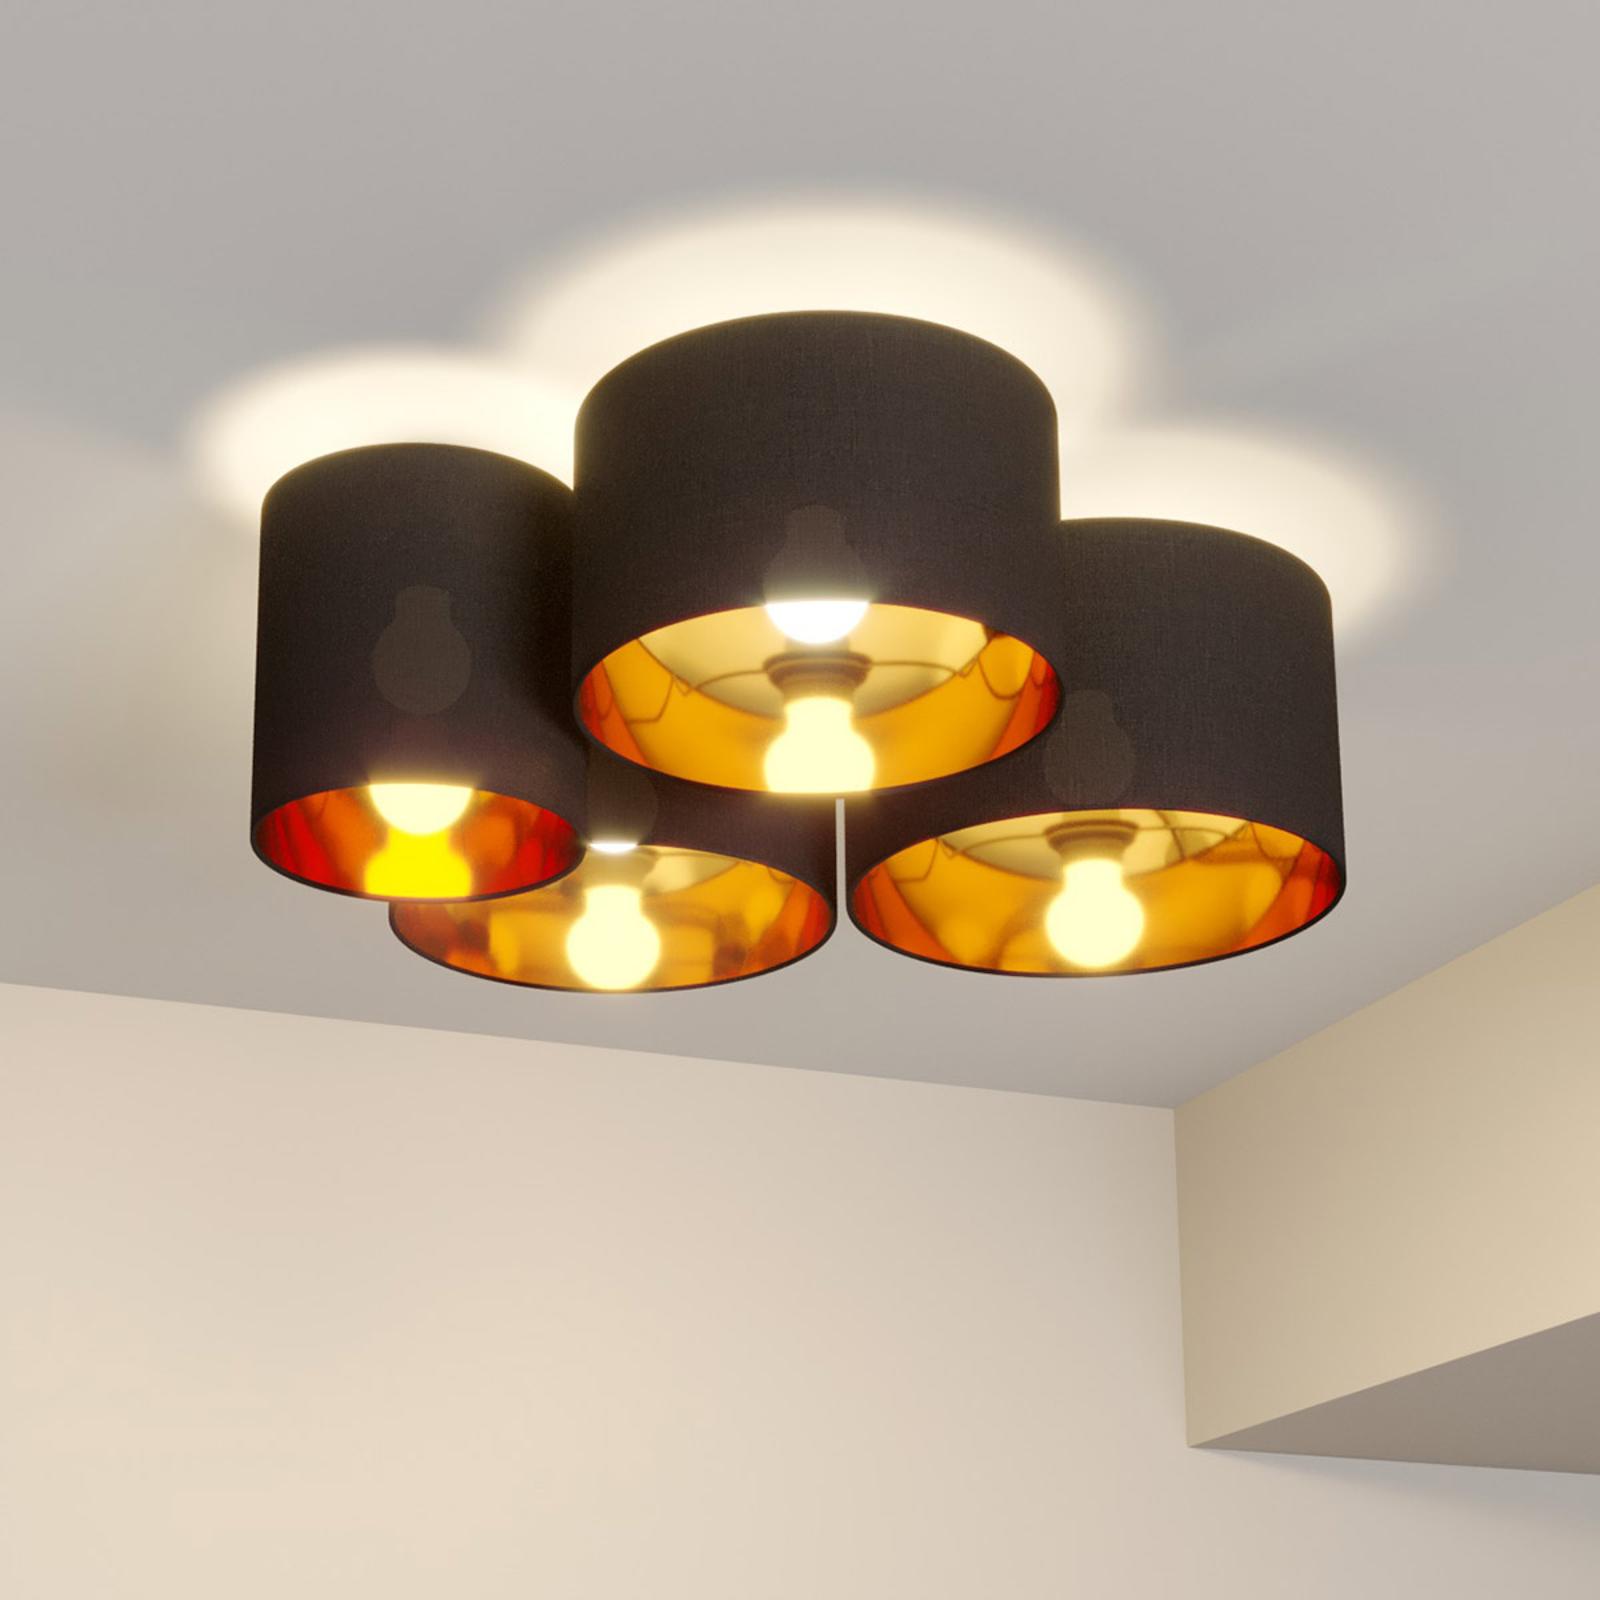 Lindby Laurenz taklampa, 4 lampor, grå-guld